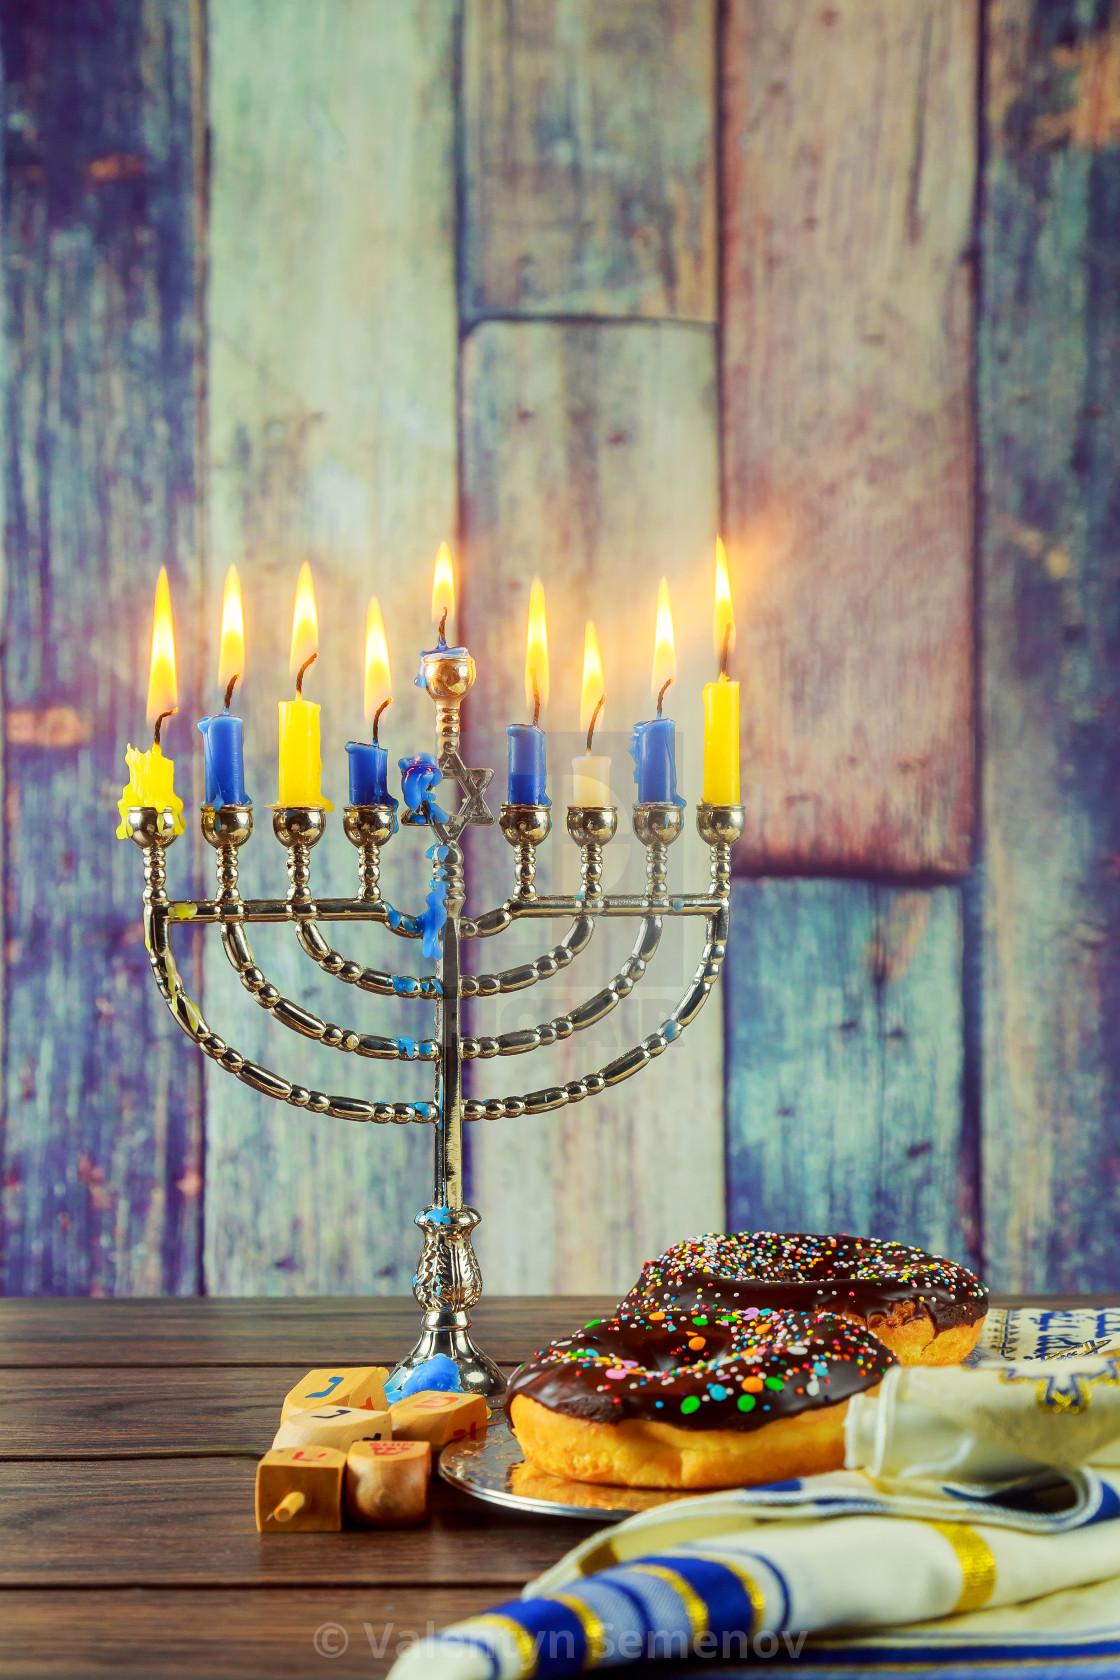 Jewish Holiday Symbol Hanukkah Background With Menorah License For